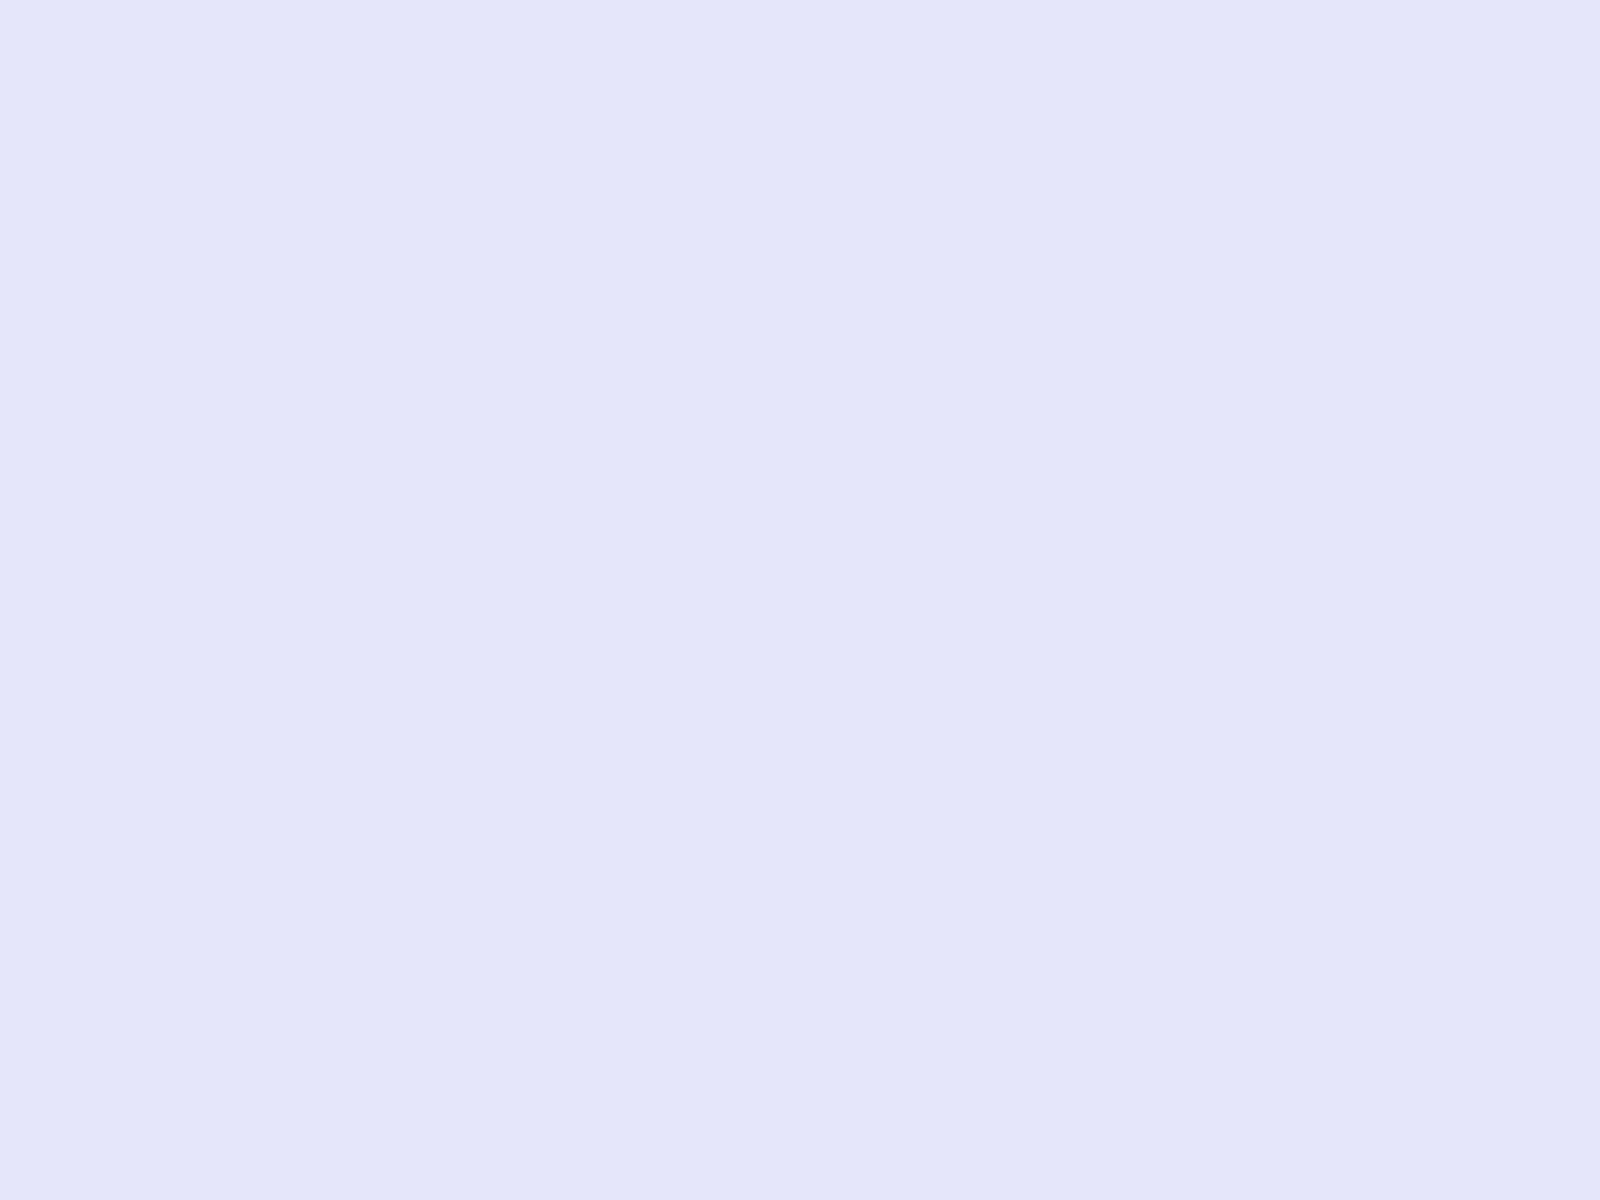 1600x1200 Lavender Web Solid Color Background